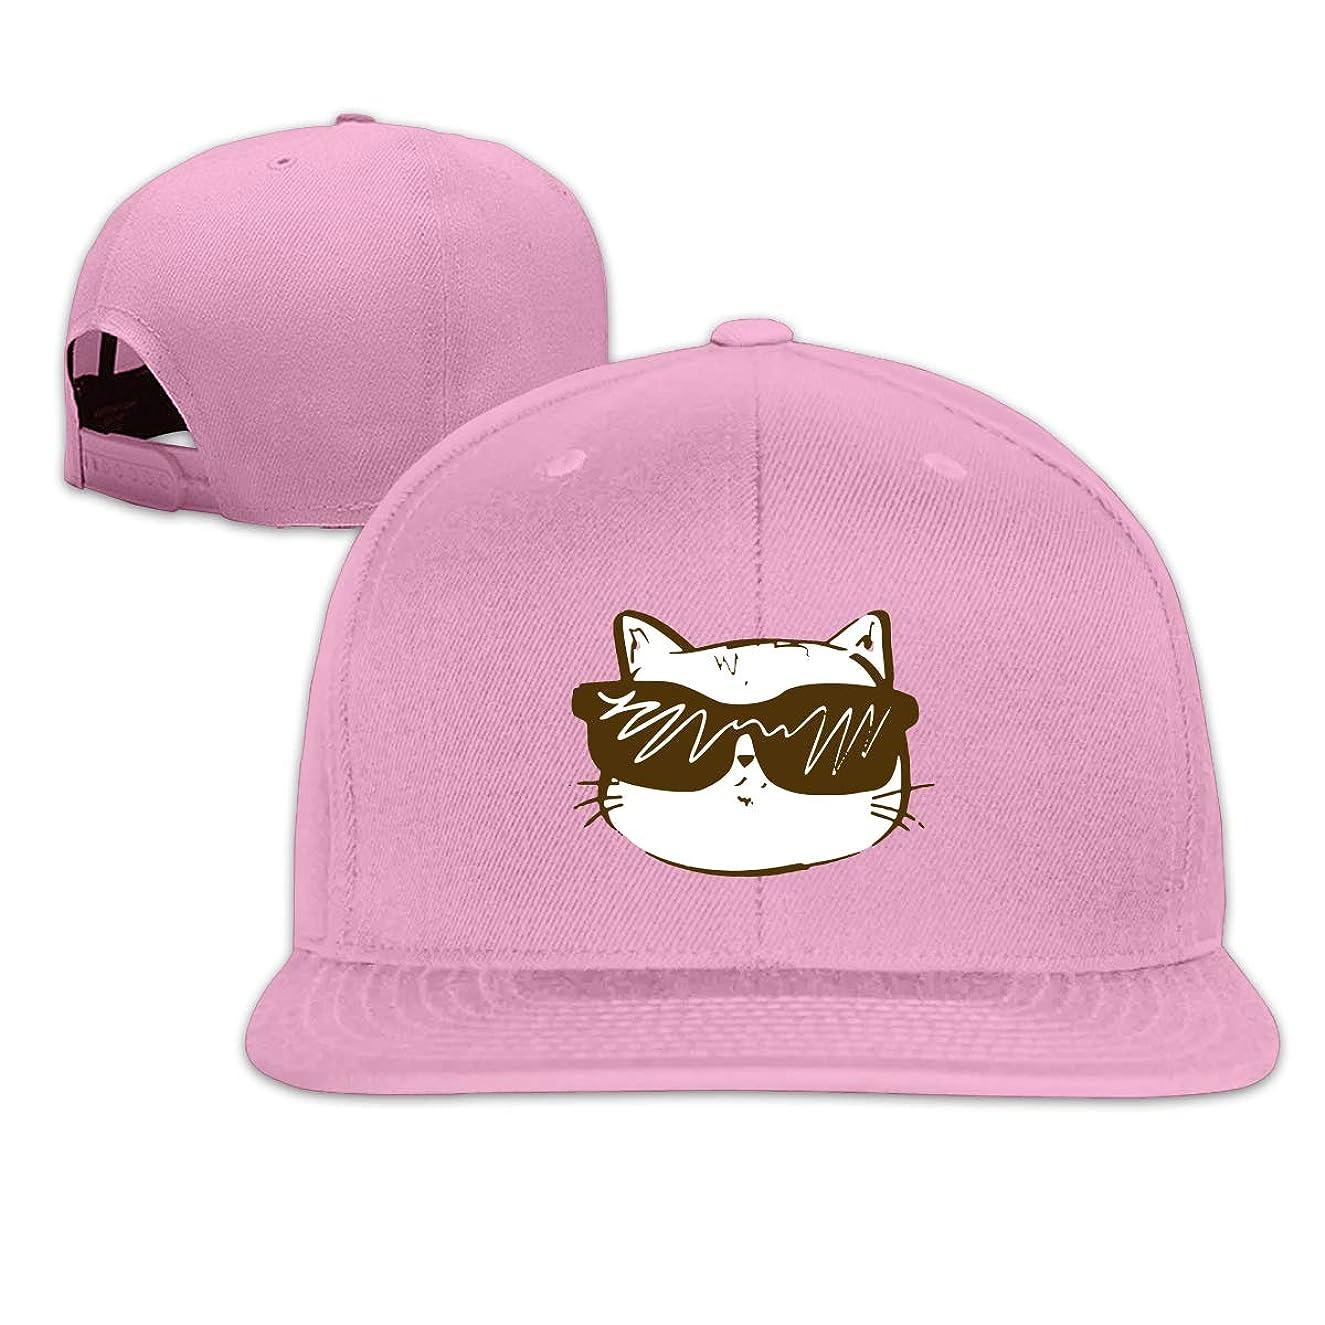 Mens Baseball Hats- Cool Cat Snapback Caps for Men Classic Adjustable 100% Cotton Running Hat